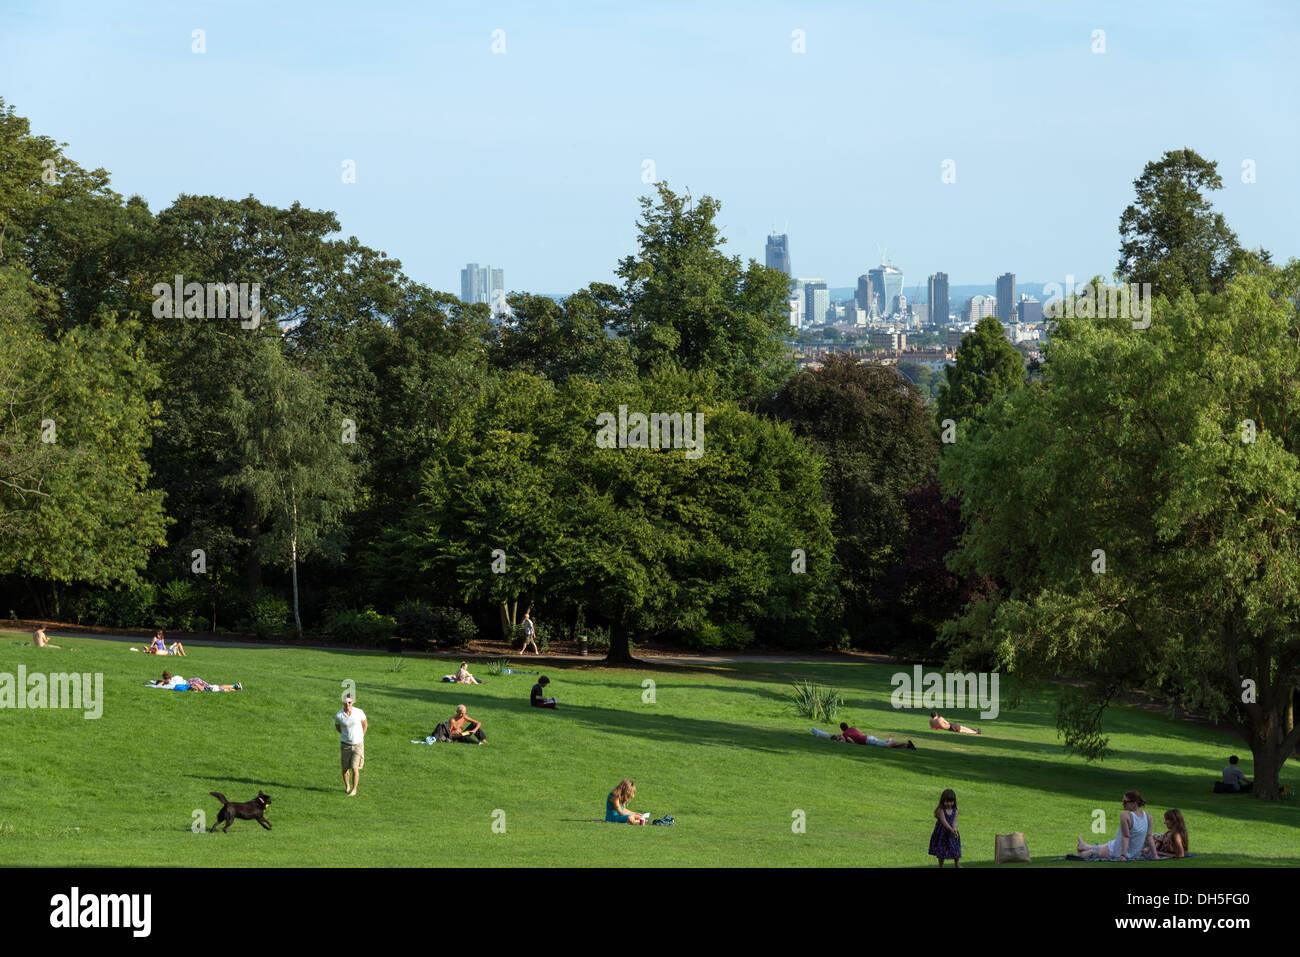 Waterlow Park, Highgate Village, London, England, UK - Stock Image